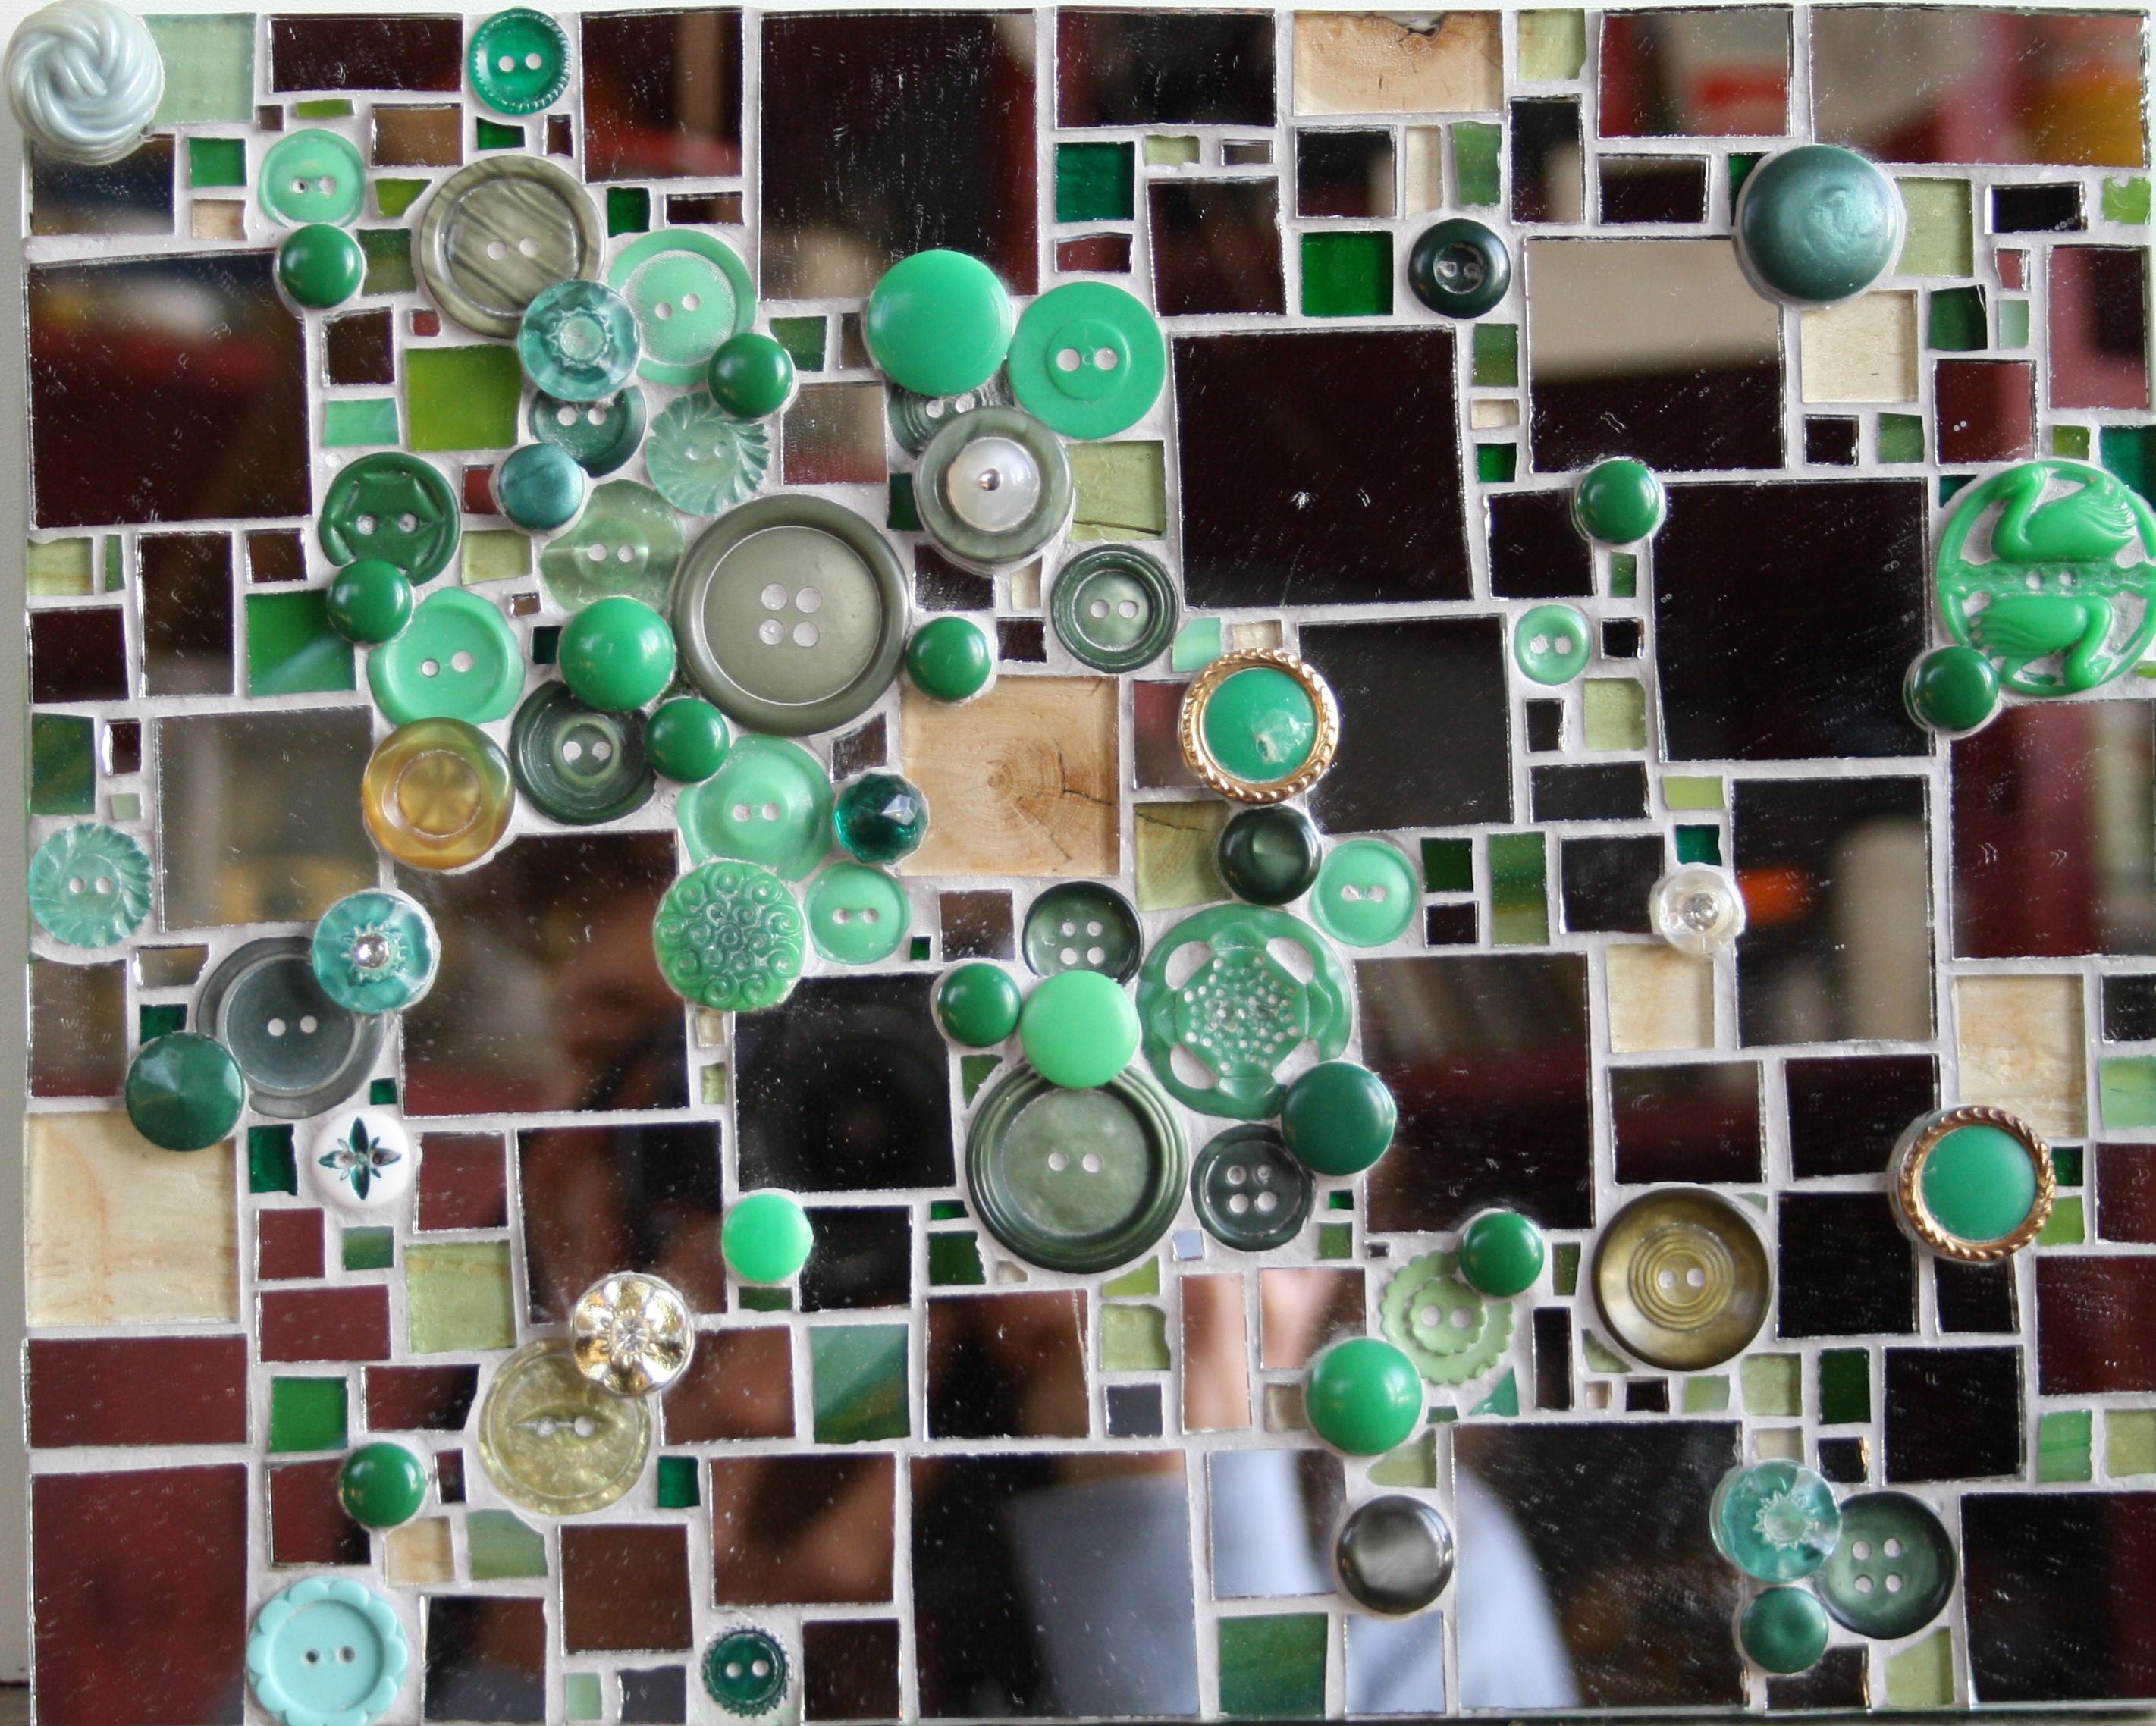 Miroir et boutons verts